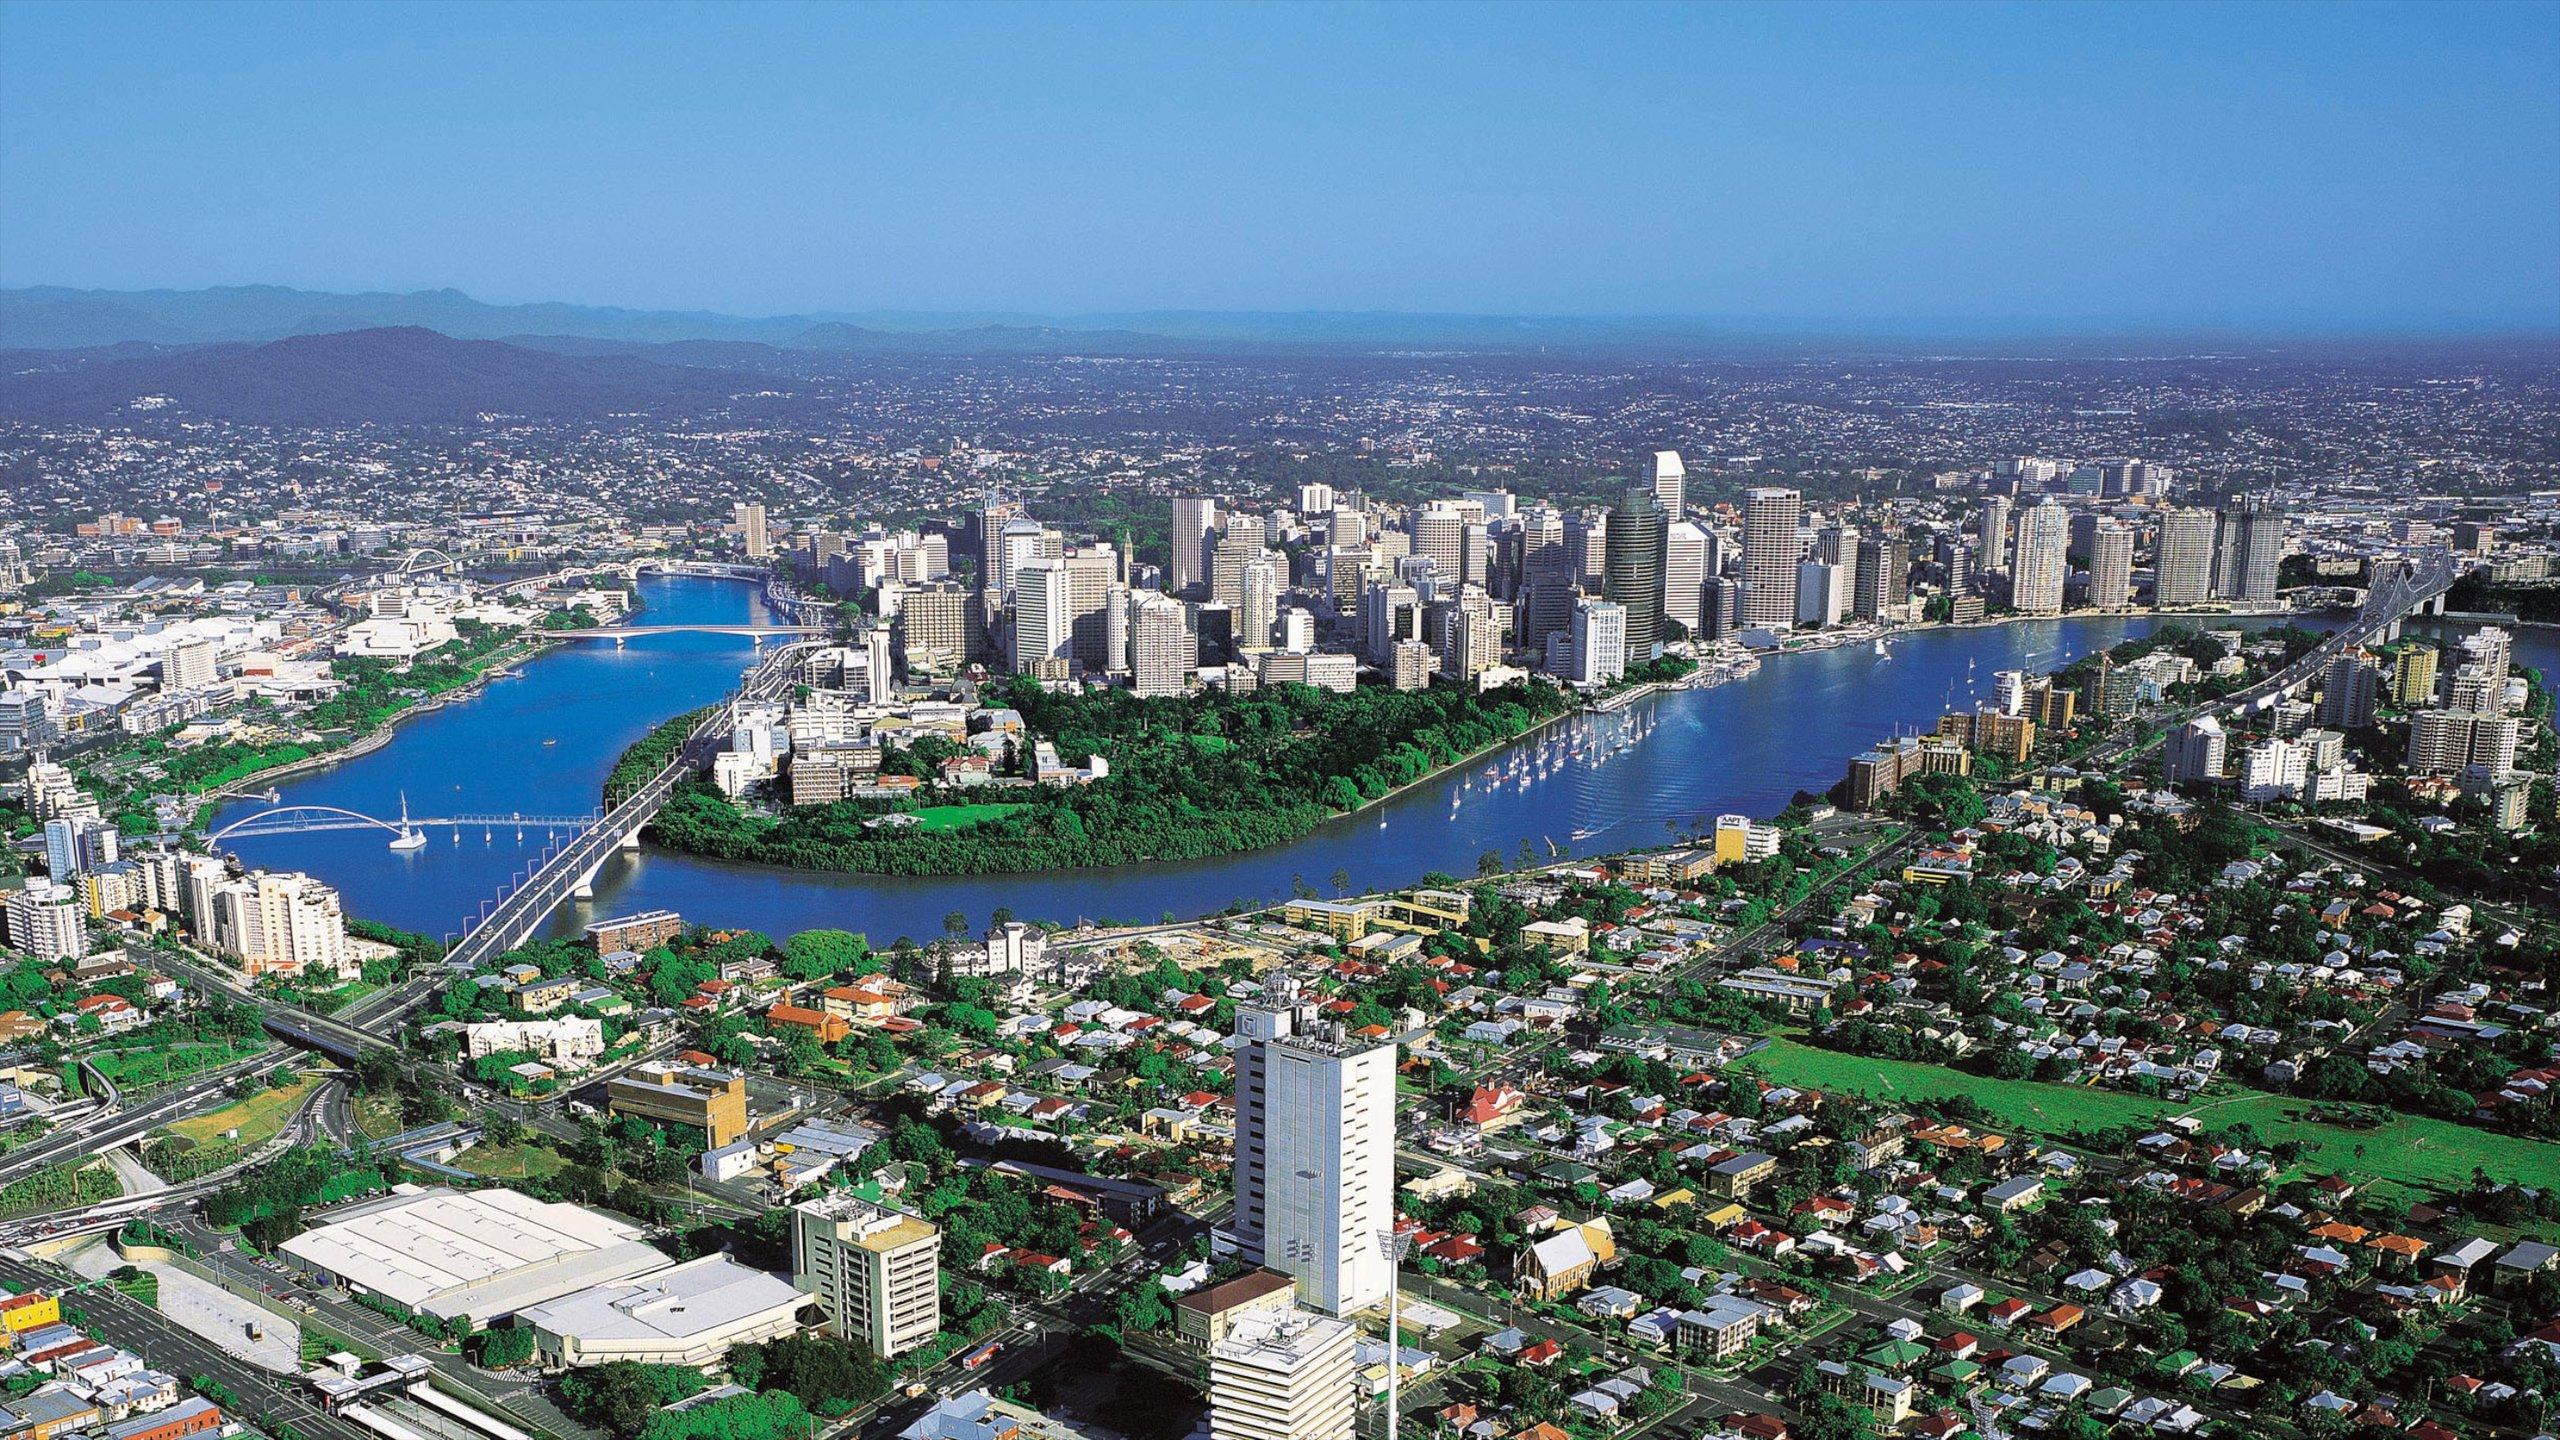 Brisbane City, Queensland, Australia